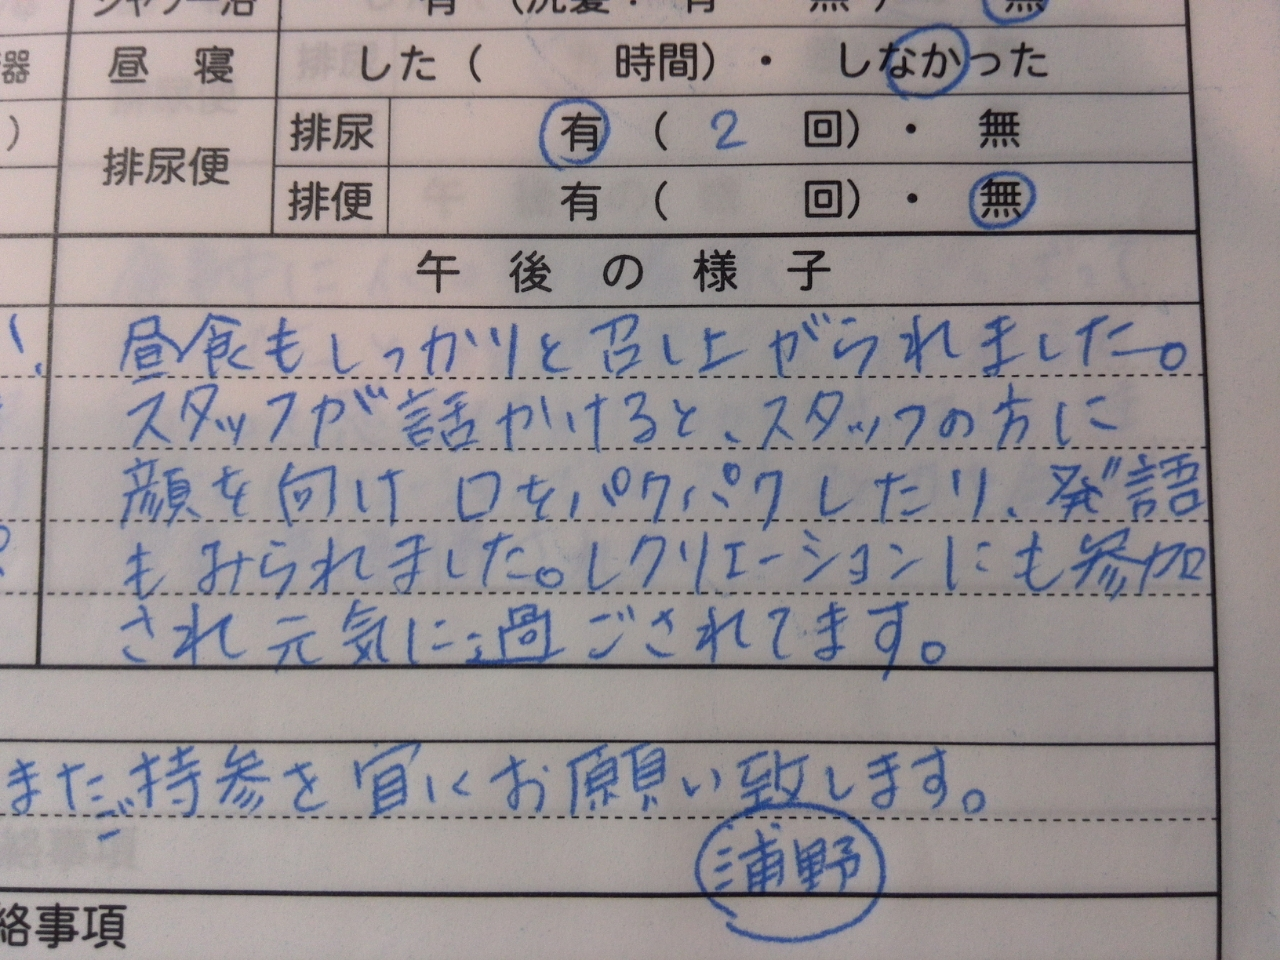 LINEcamera_share_2014-06-07-00-09-51.jpg